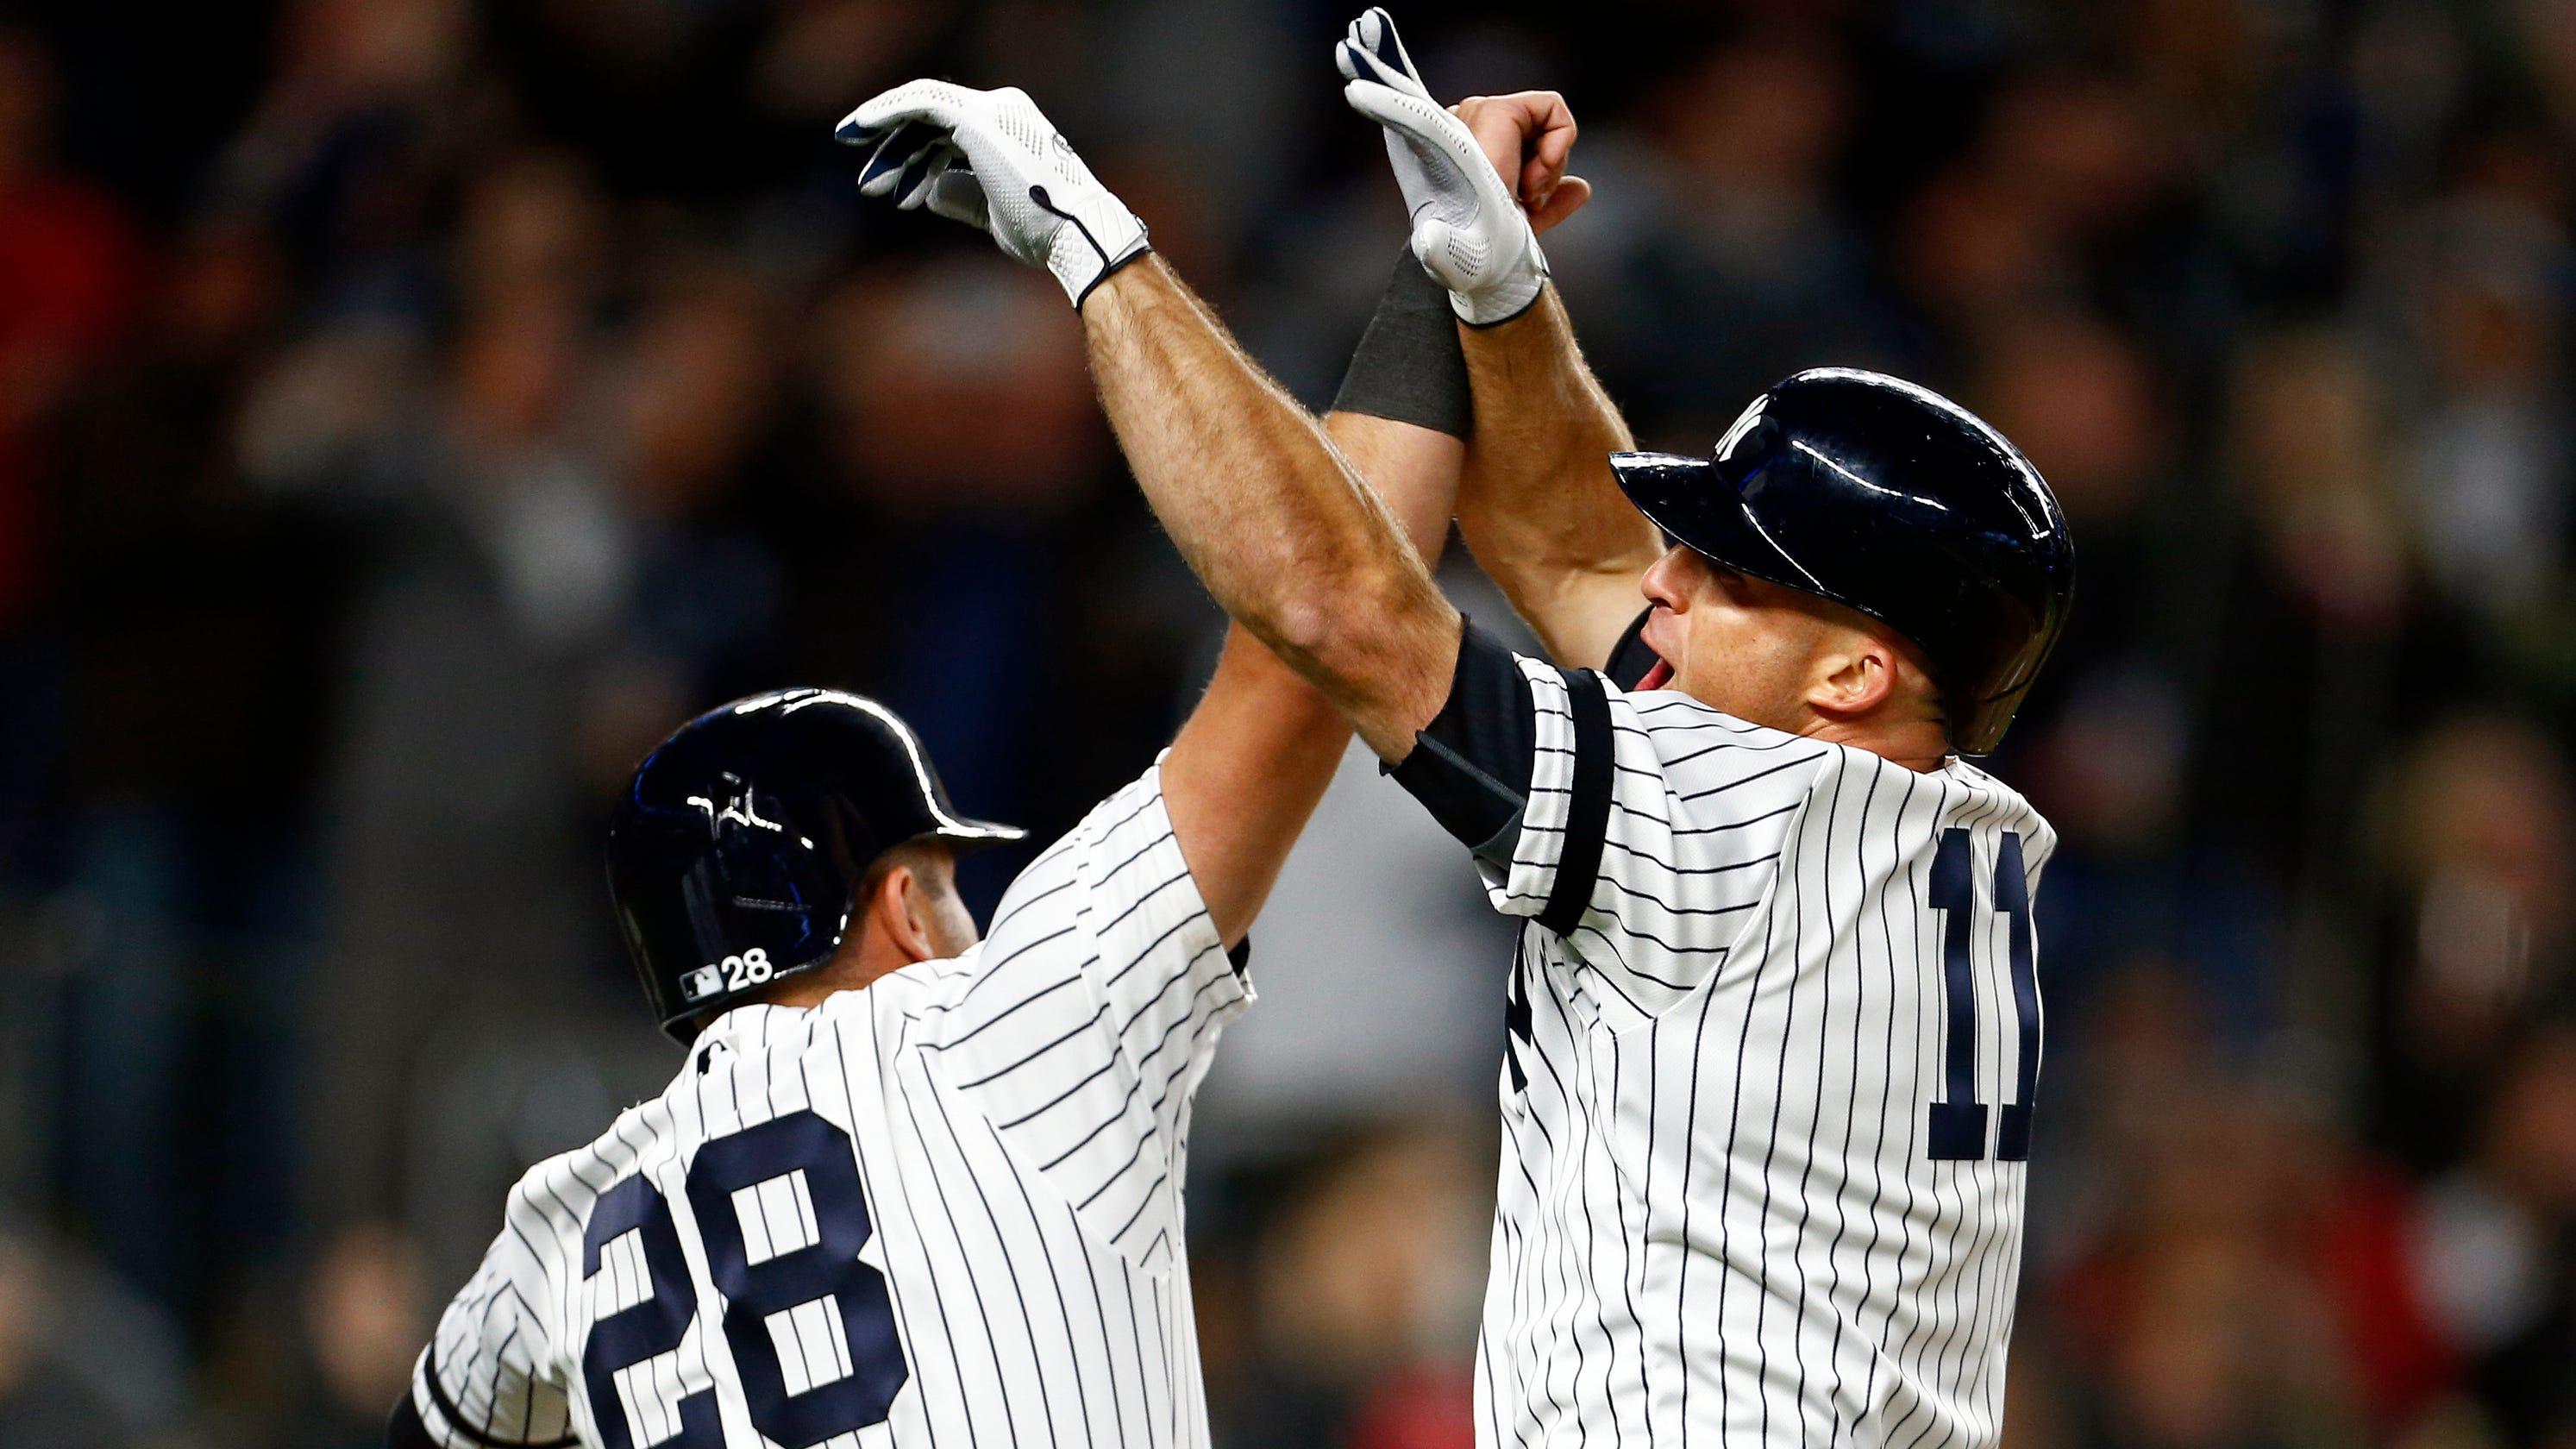 new concept 3e651 0b255 Brett Gardner grand slam lifts Yankees past Red Sox